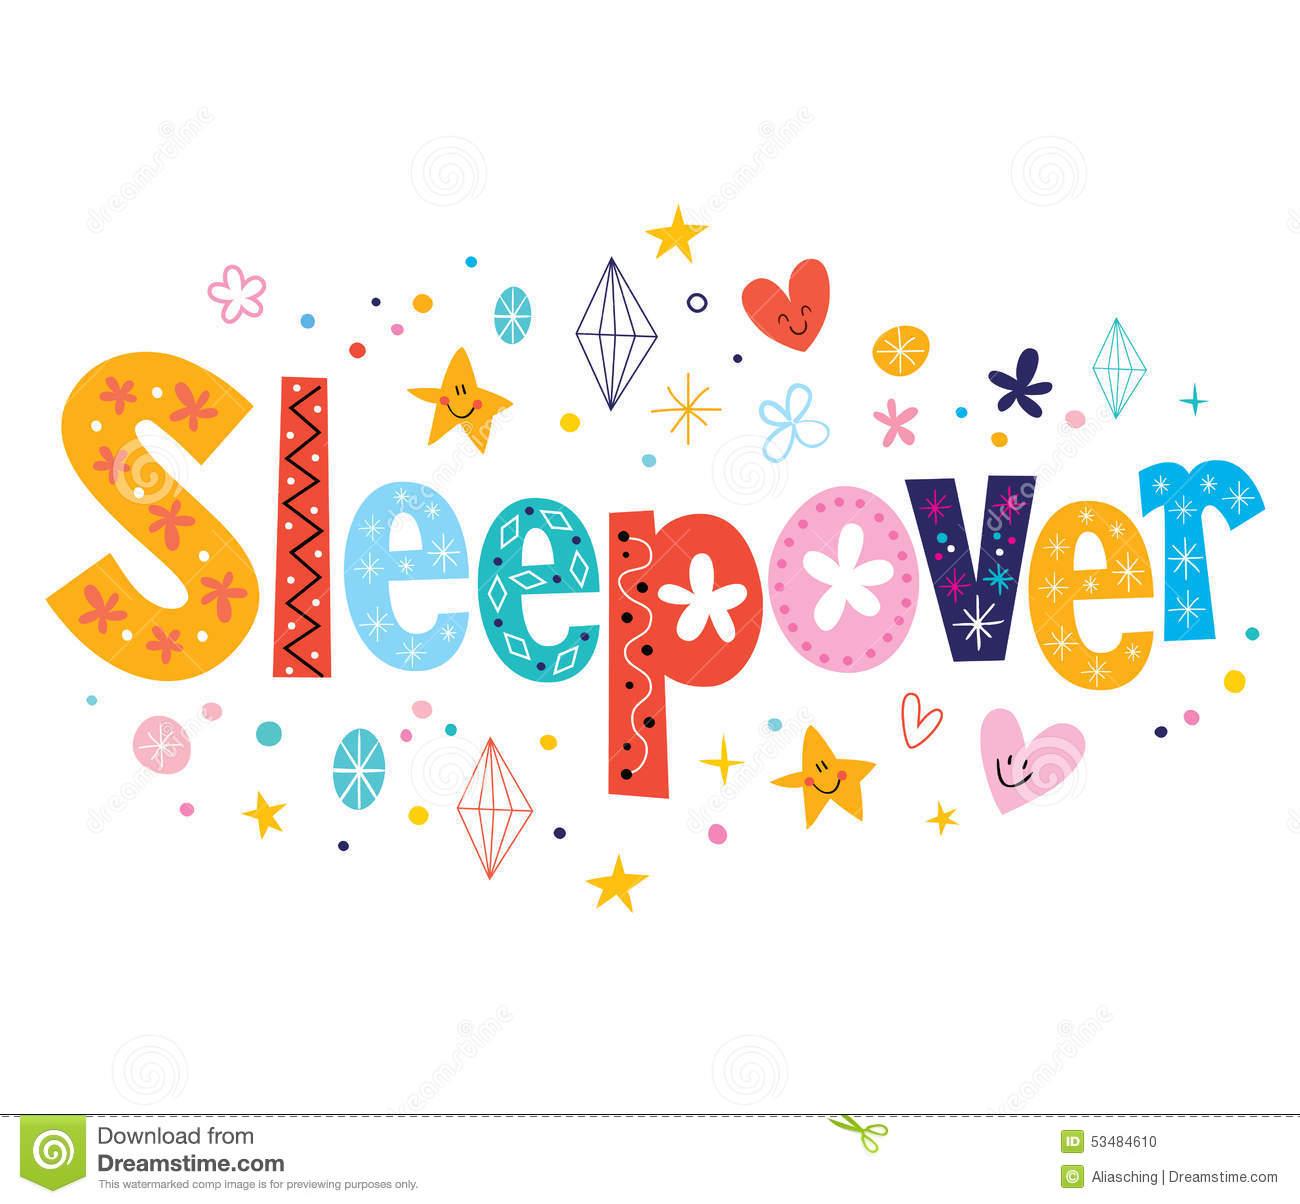 Sleepover Stock Photo-Sleepover Stock Photo-17